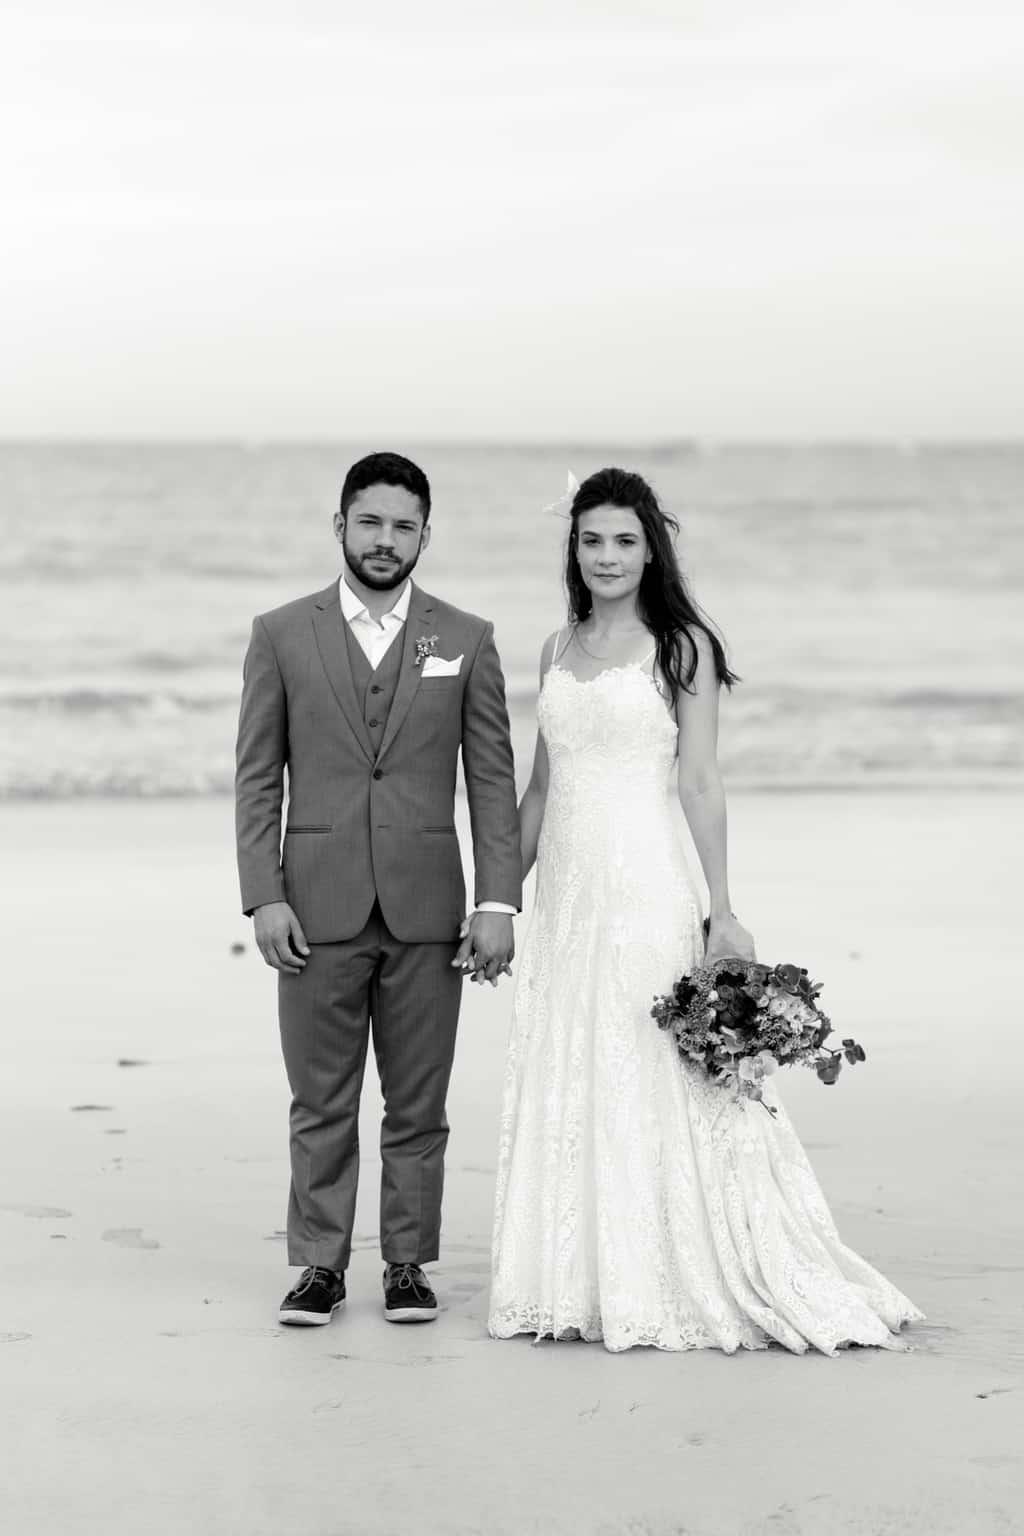 Casamento-Emanuelle-e-Alysson-Fotografia-Tadeu-Nanó-e-Luca-Antunes-914